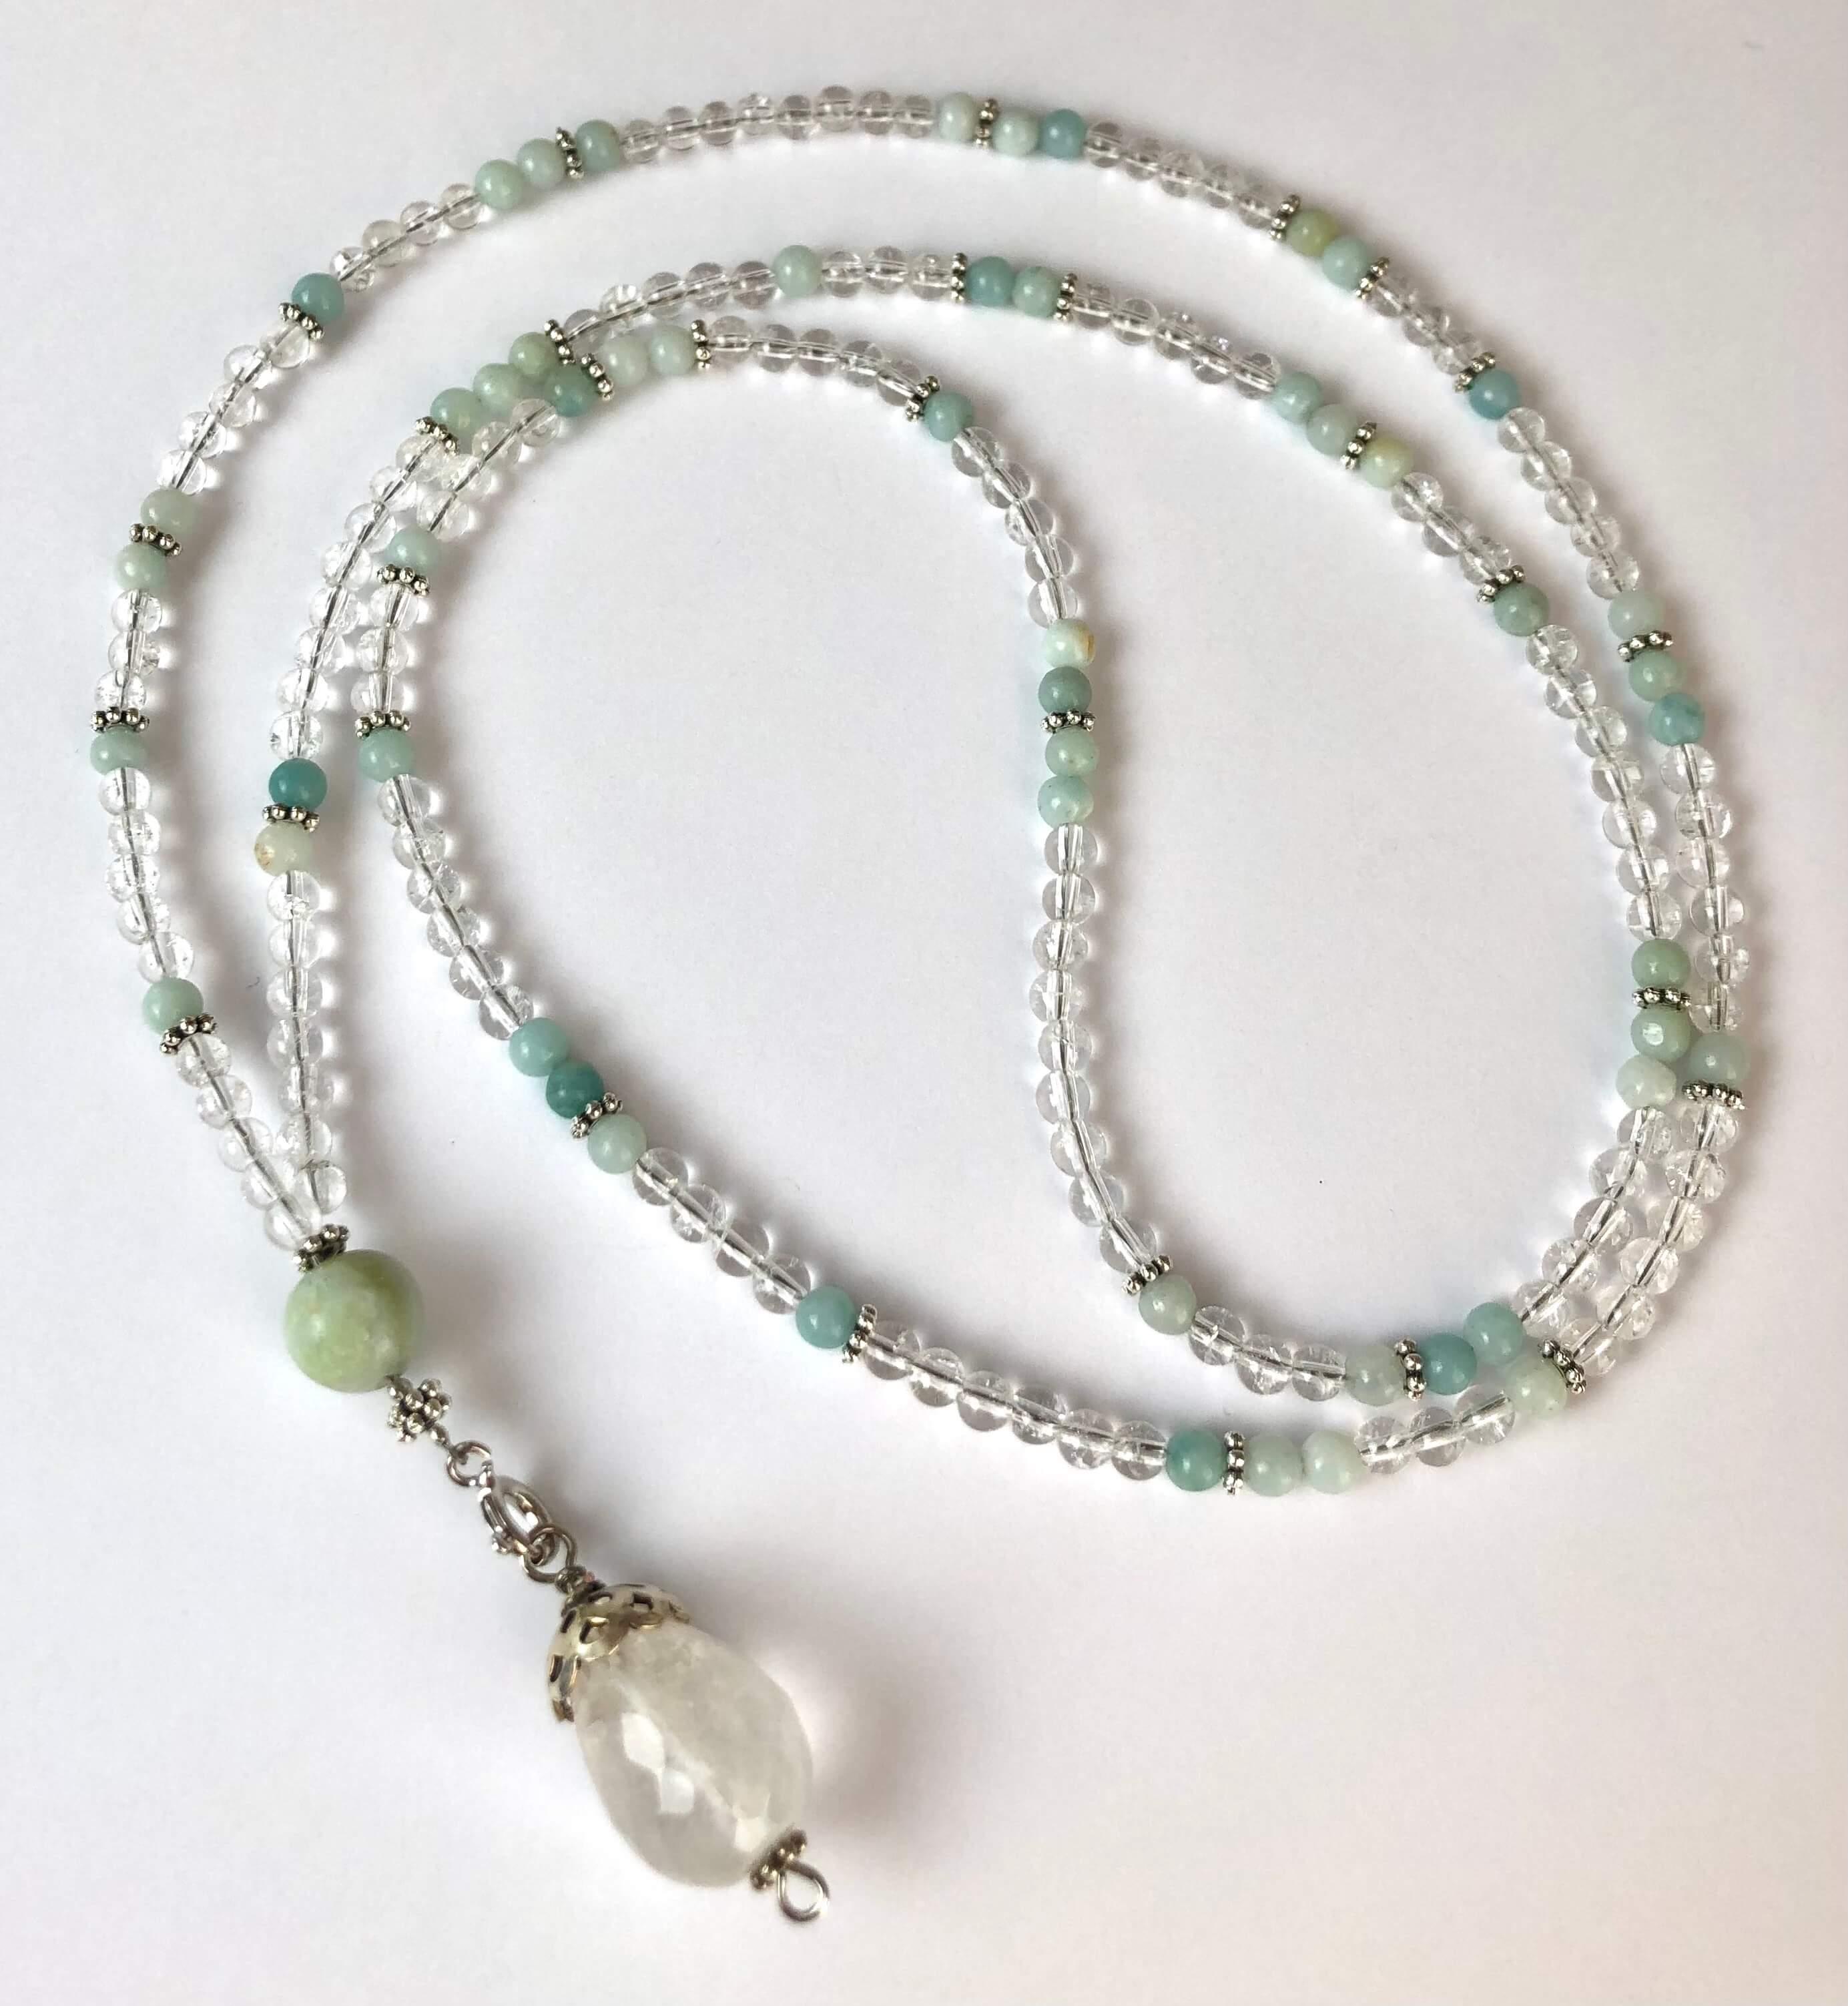 Rock Crystal & Amazonite Necklace